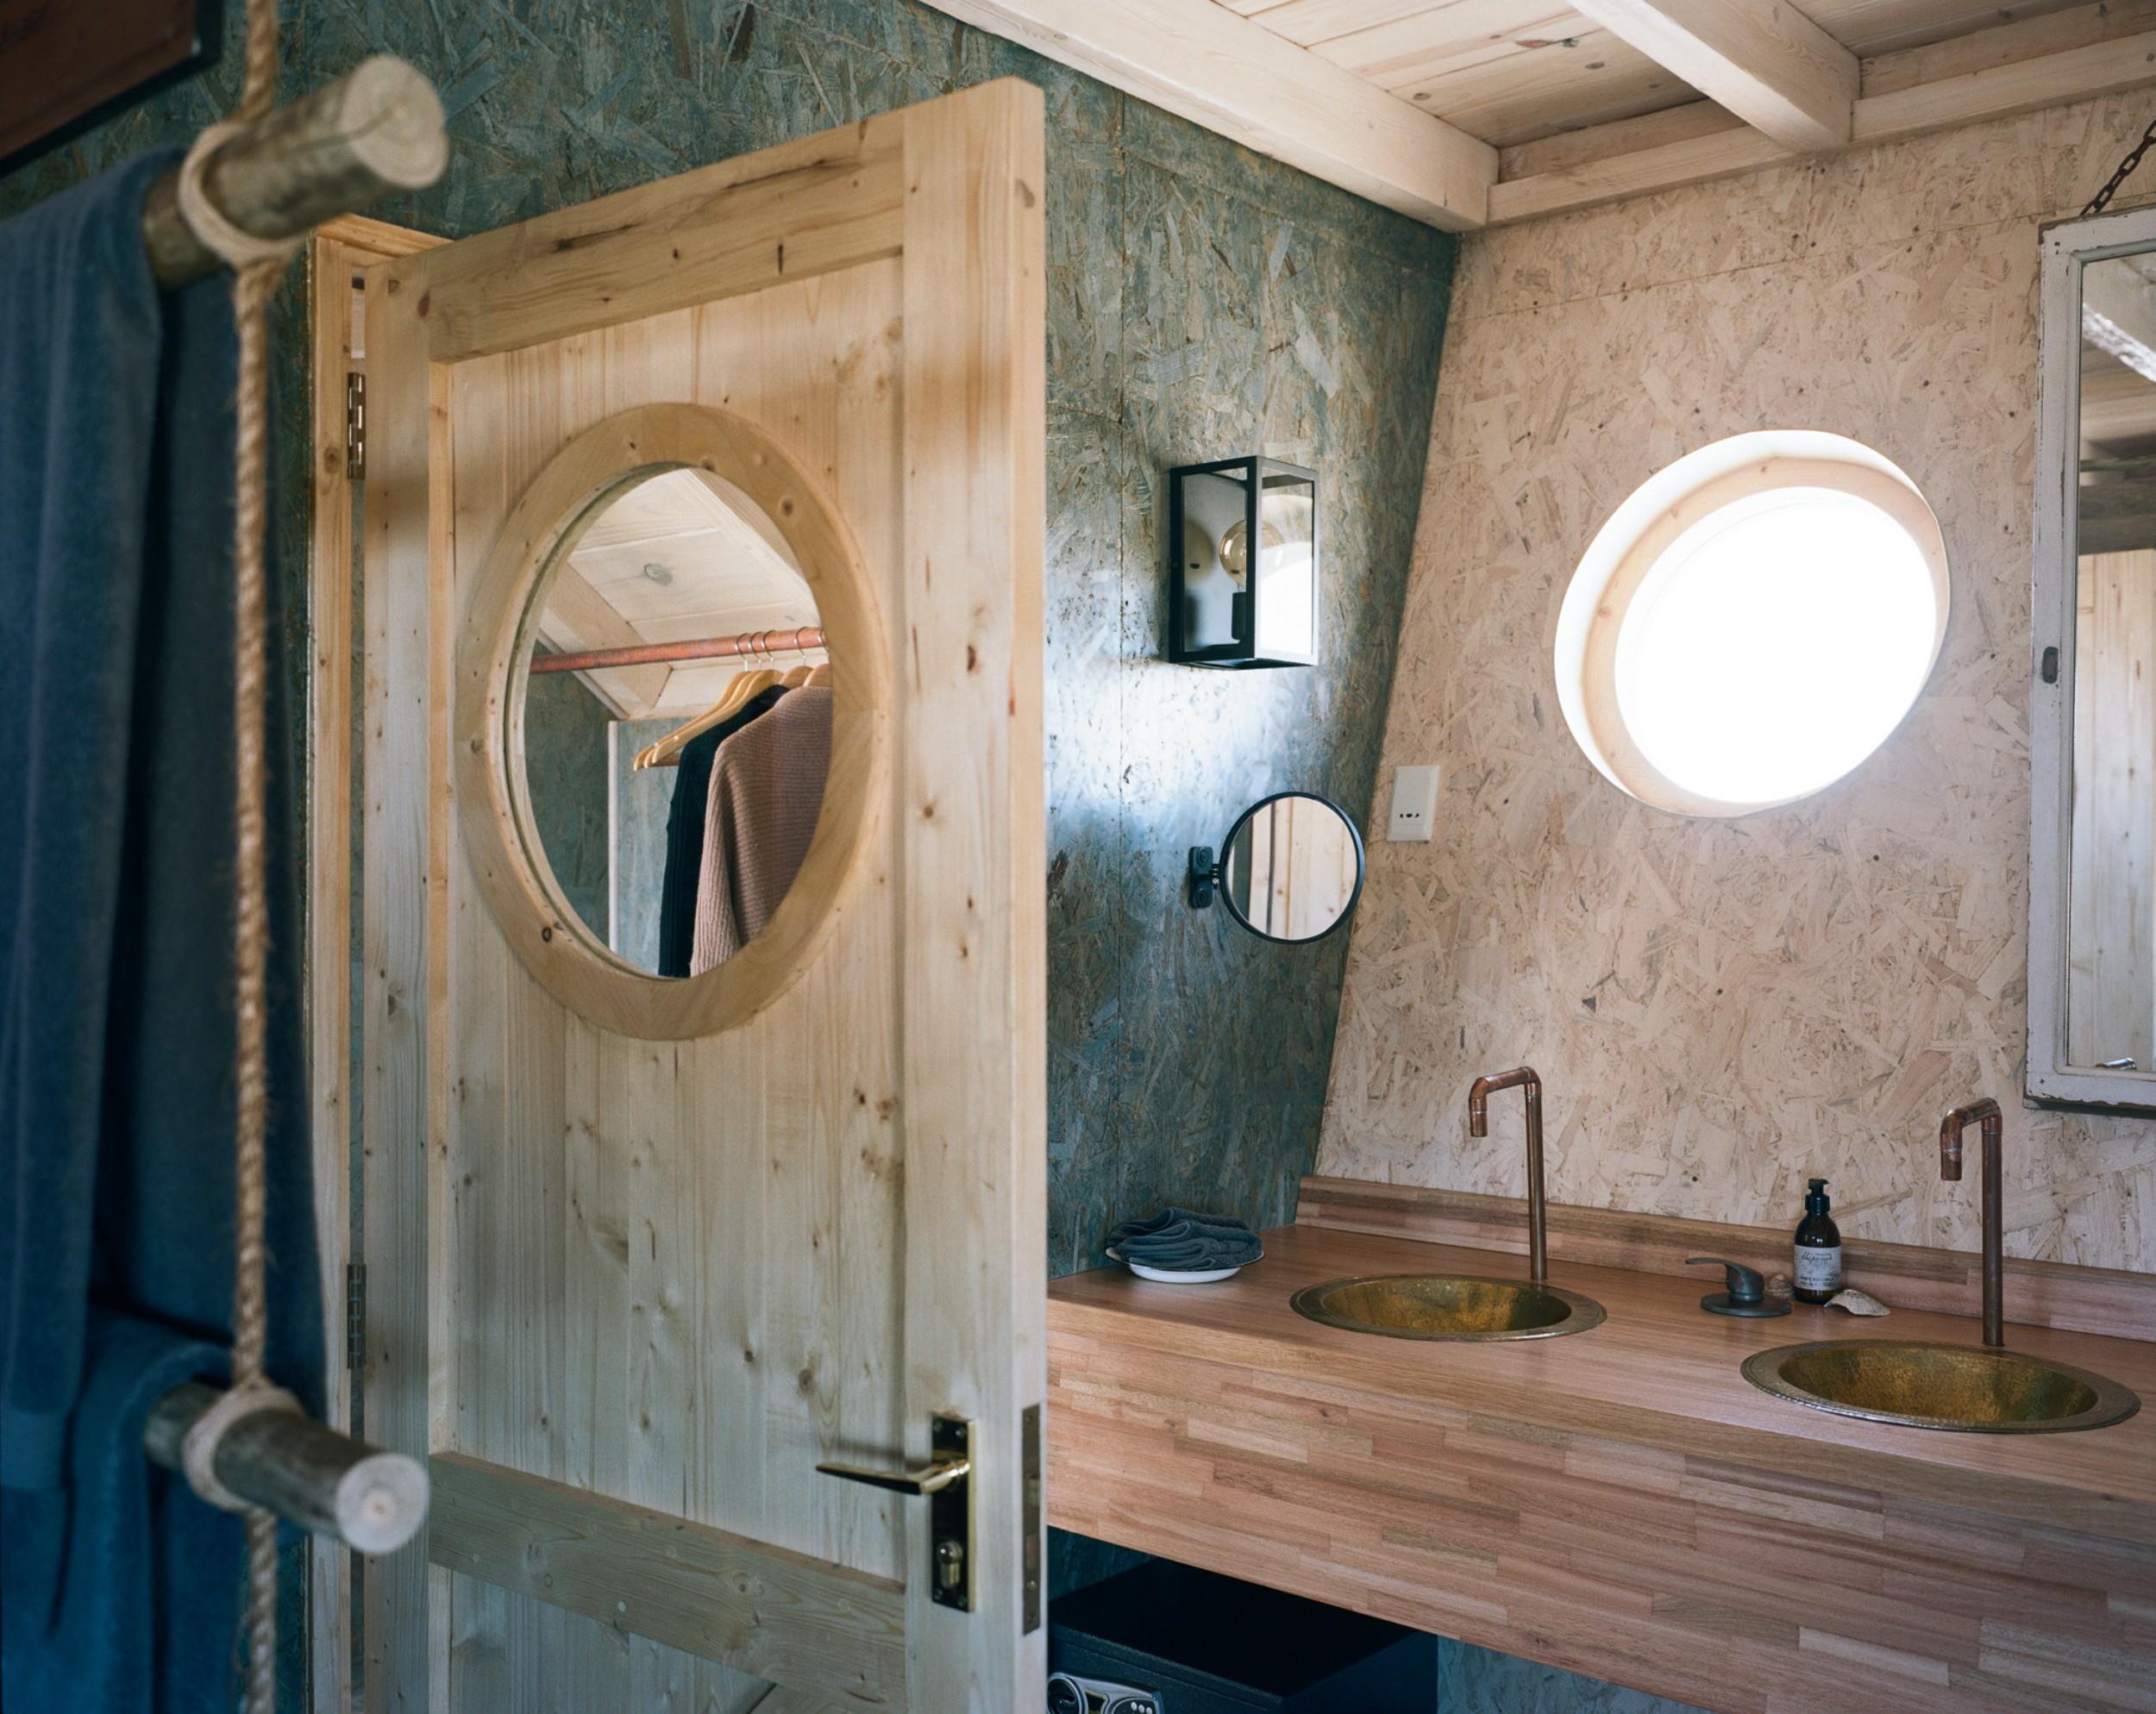 8Shipwreck Lodge - Accommodation - Bathroom sinks.jpg